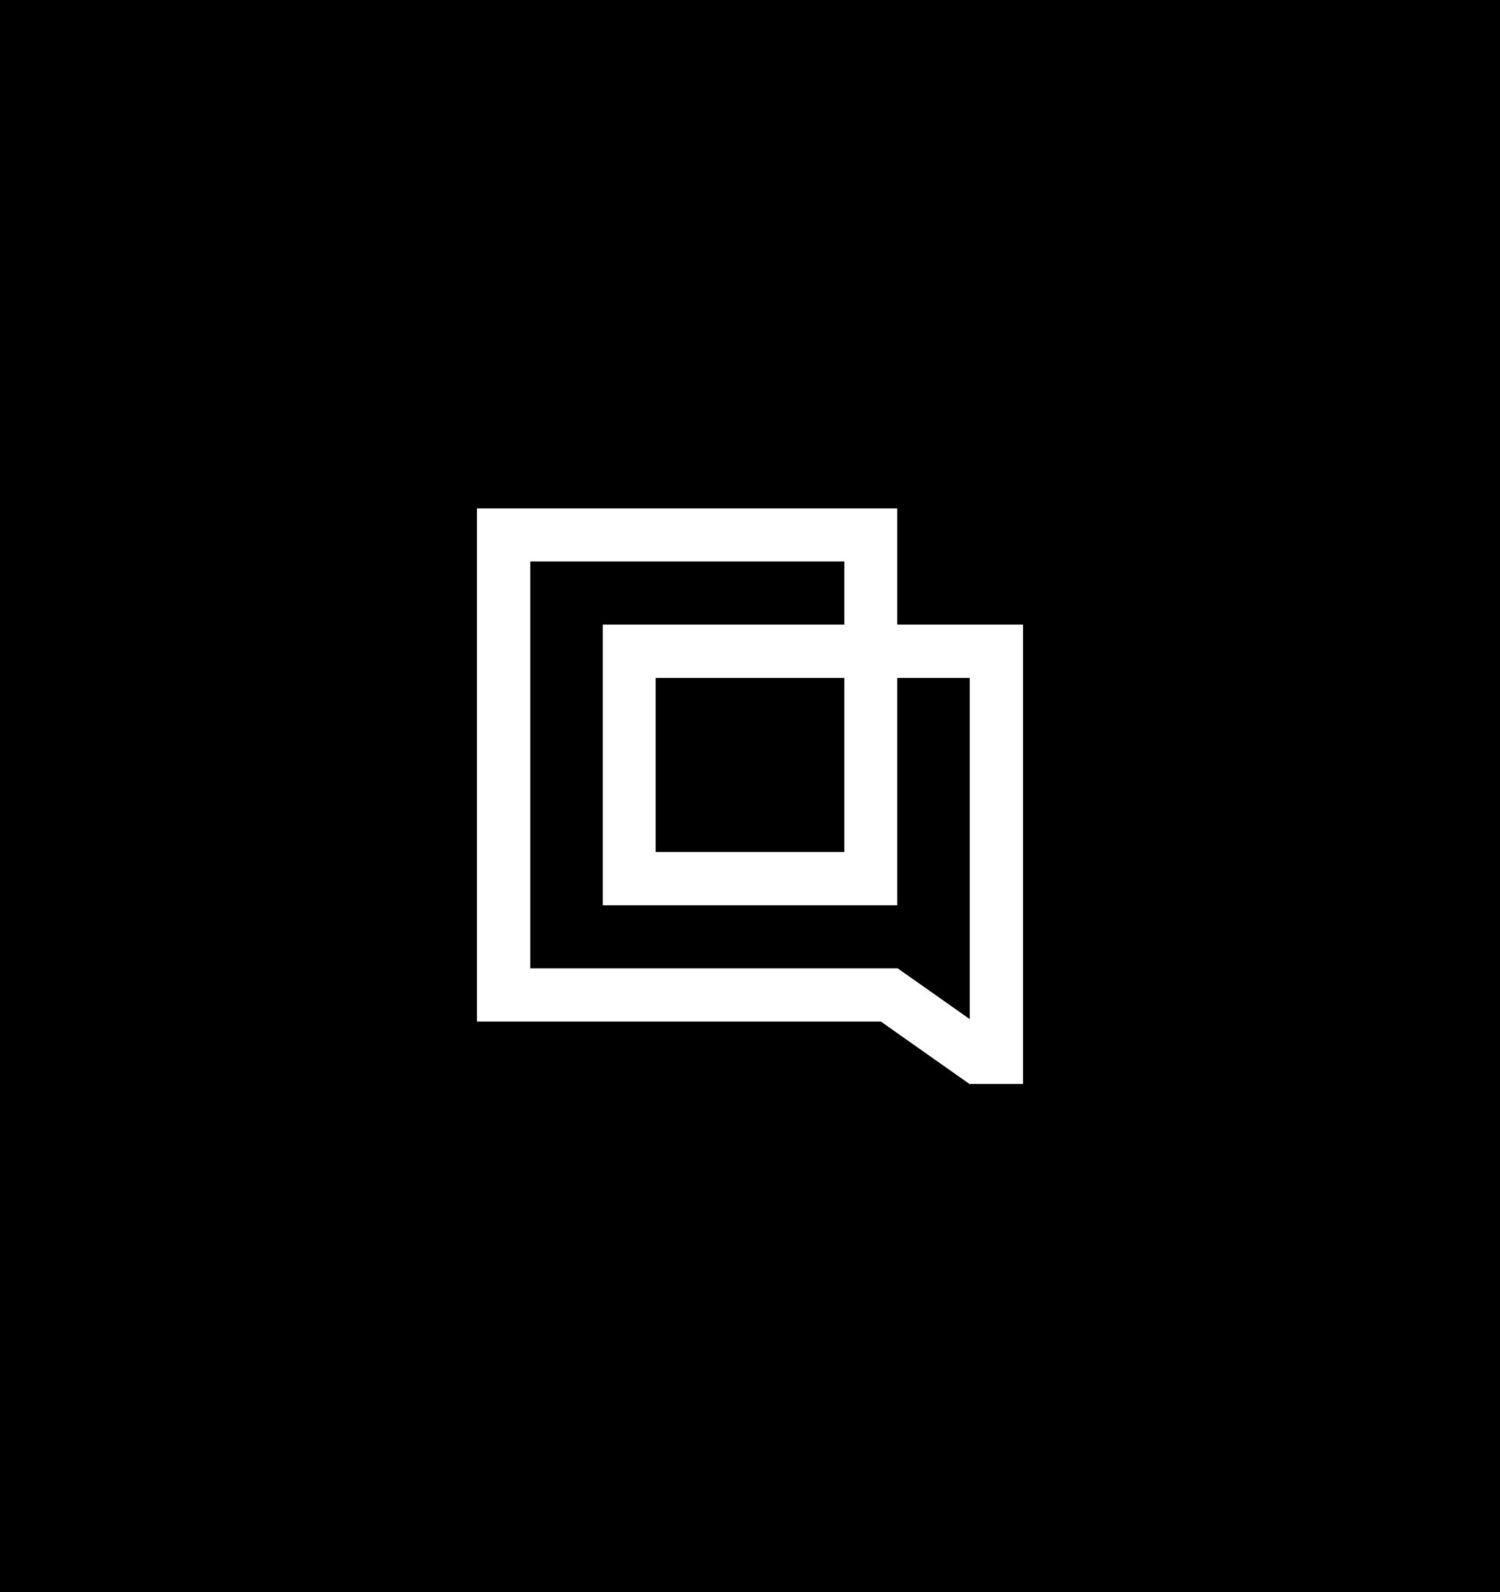 Design logo symbol logomark mariusnedelcu ello